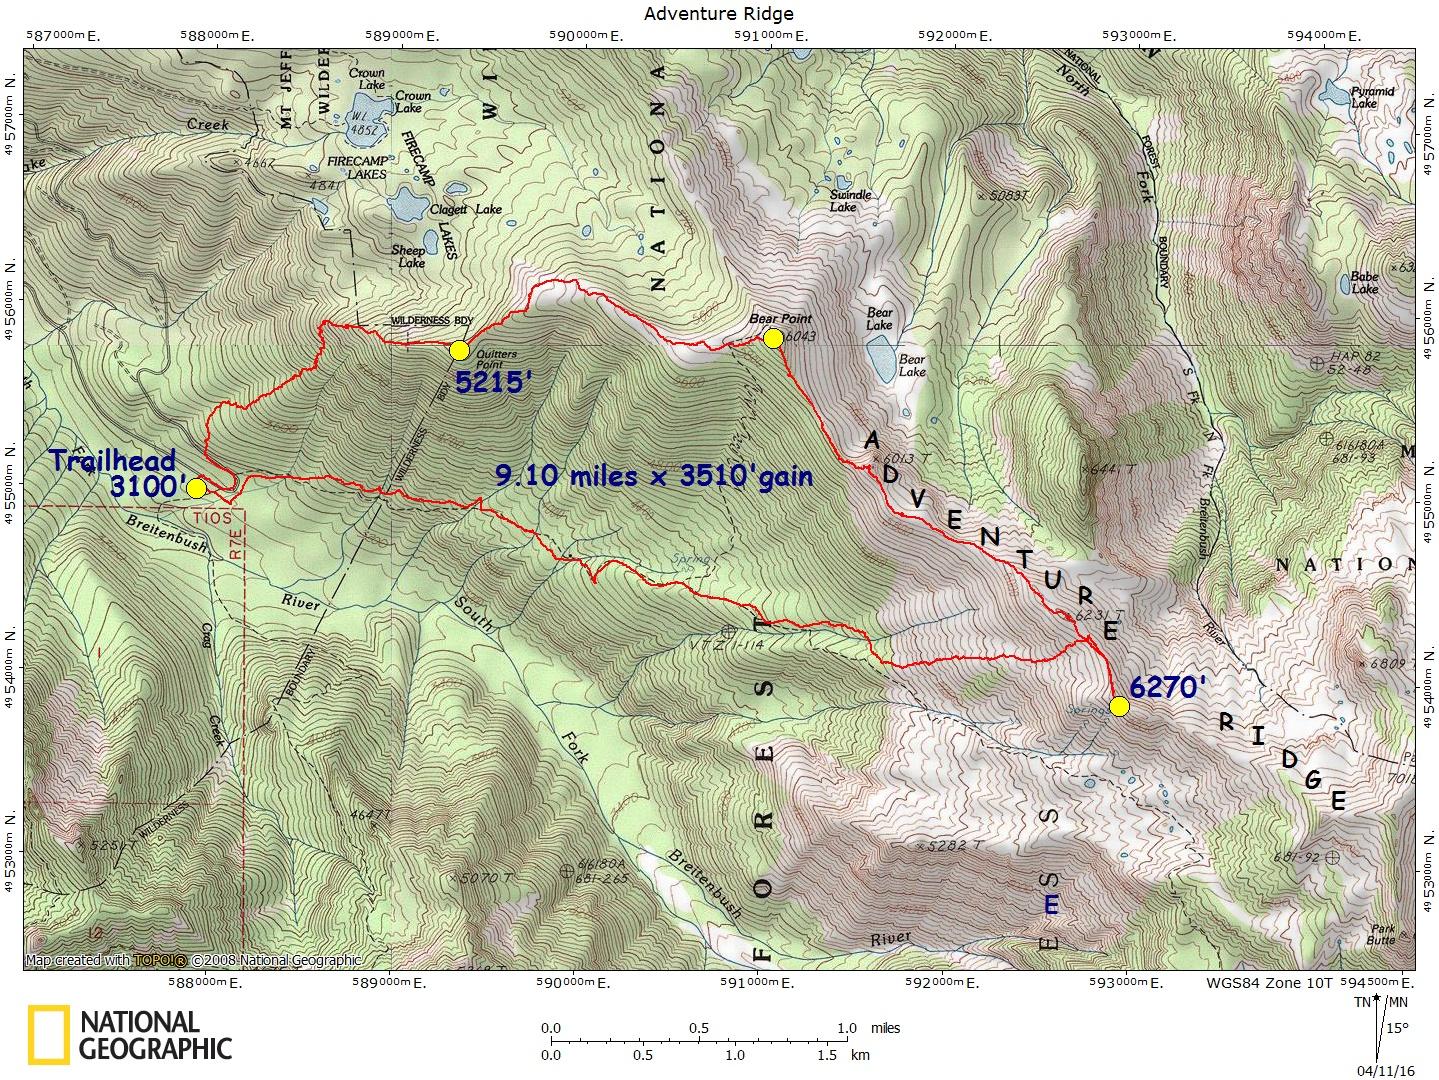 Maps and GPS tracks – NW Adventures, Maps & GPS Tracks